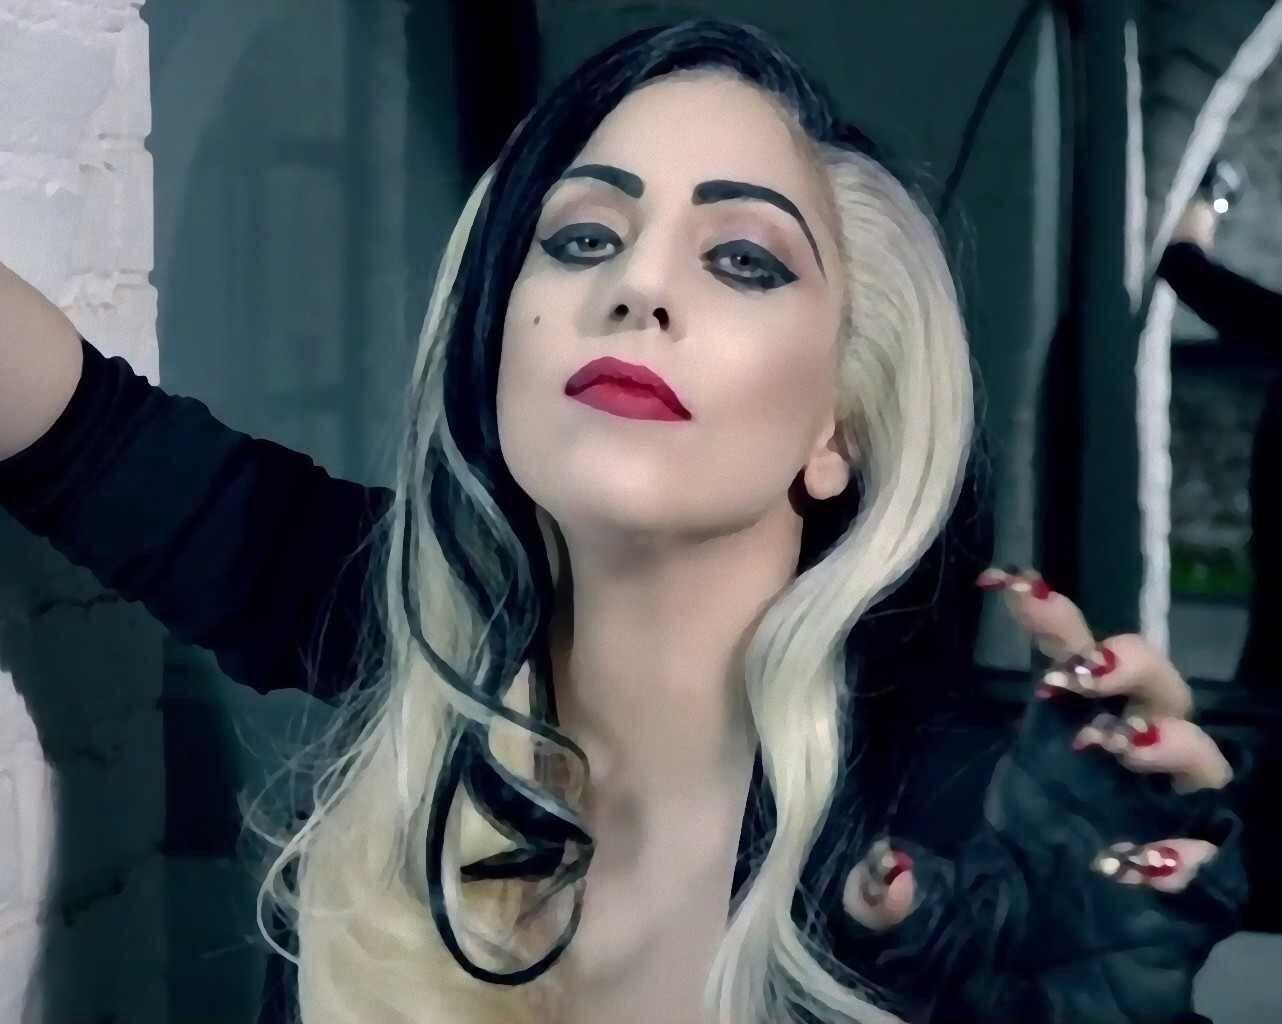 Black Bangs Days Lady Gaga Pictures Lady Gaga Photos Lady Gaga